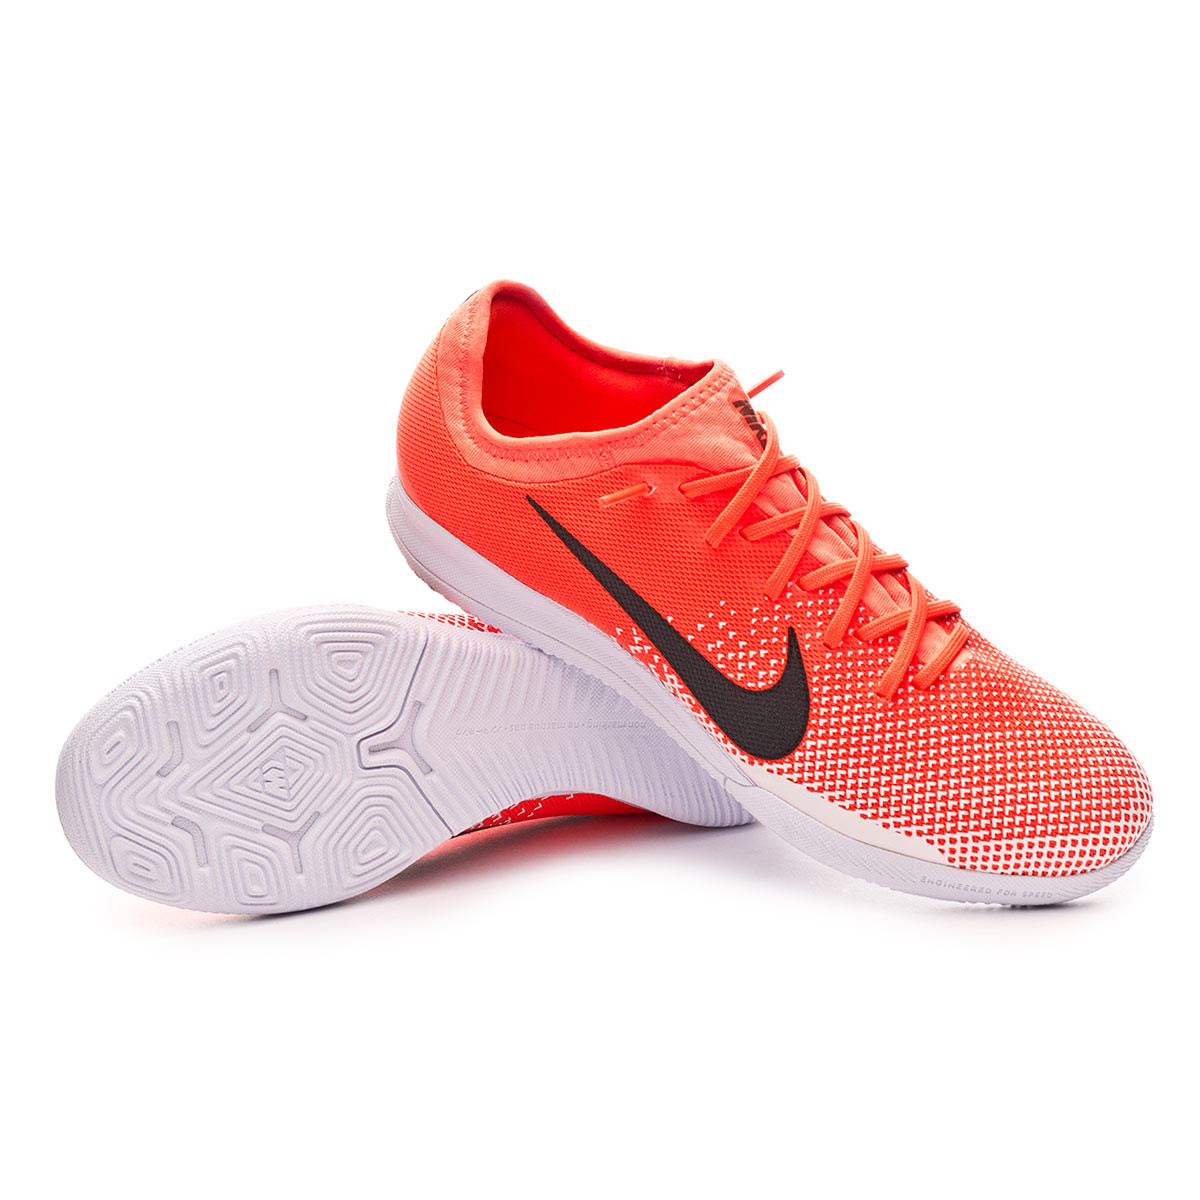 68b93cf54 Futsal Boot Nike Mercurial VaporX XII Pro IC Hyper crimson-Black-White -  Football store Fútbol Emotion